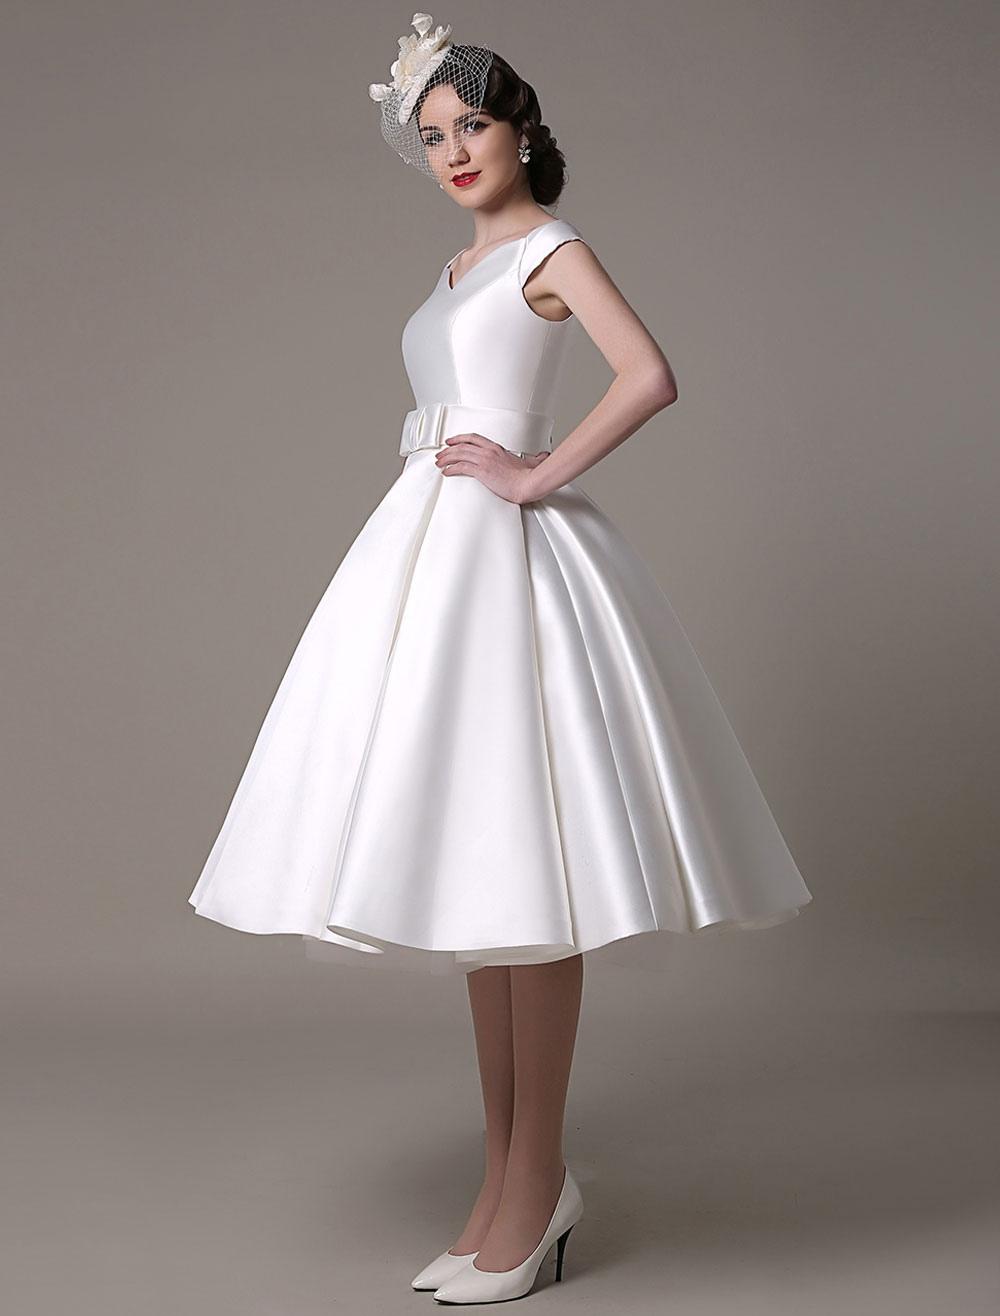 Ivory Wedding Dress Bateau Knee-Length Sash Satin Wedding Gown Milanoo